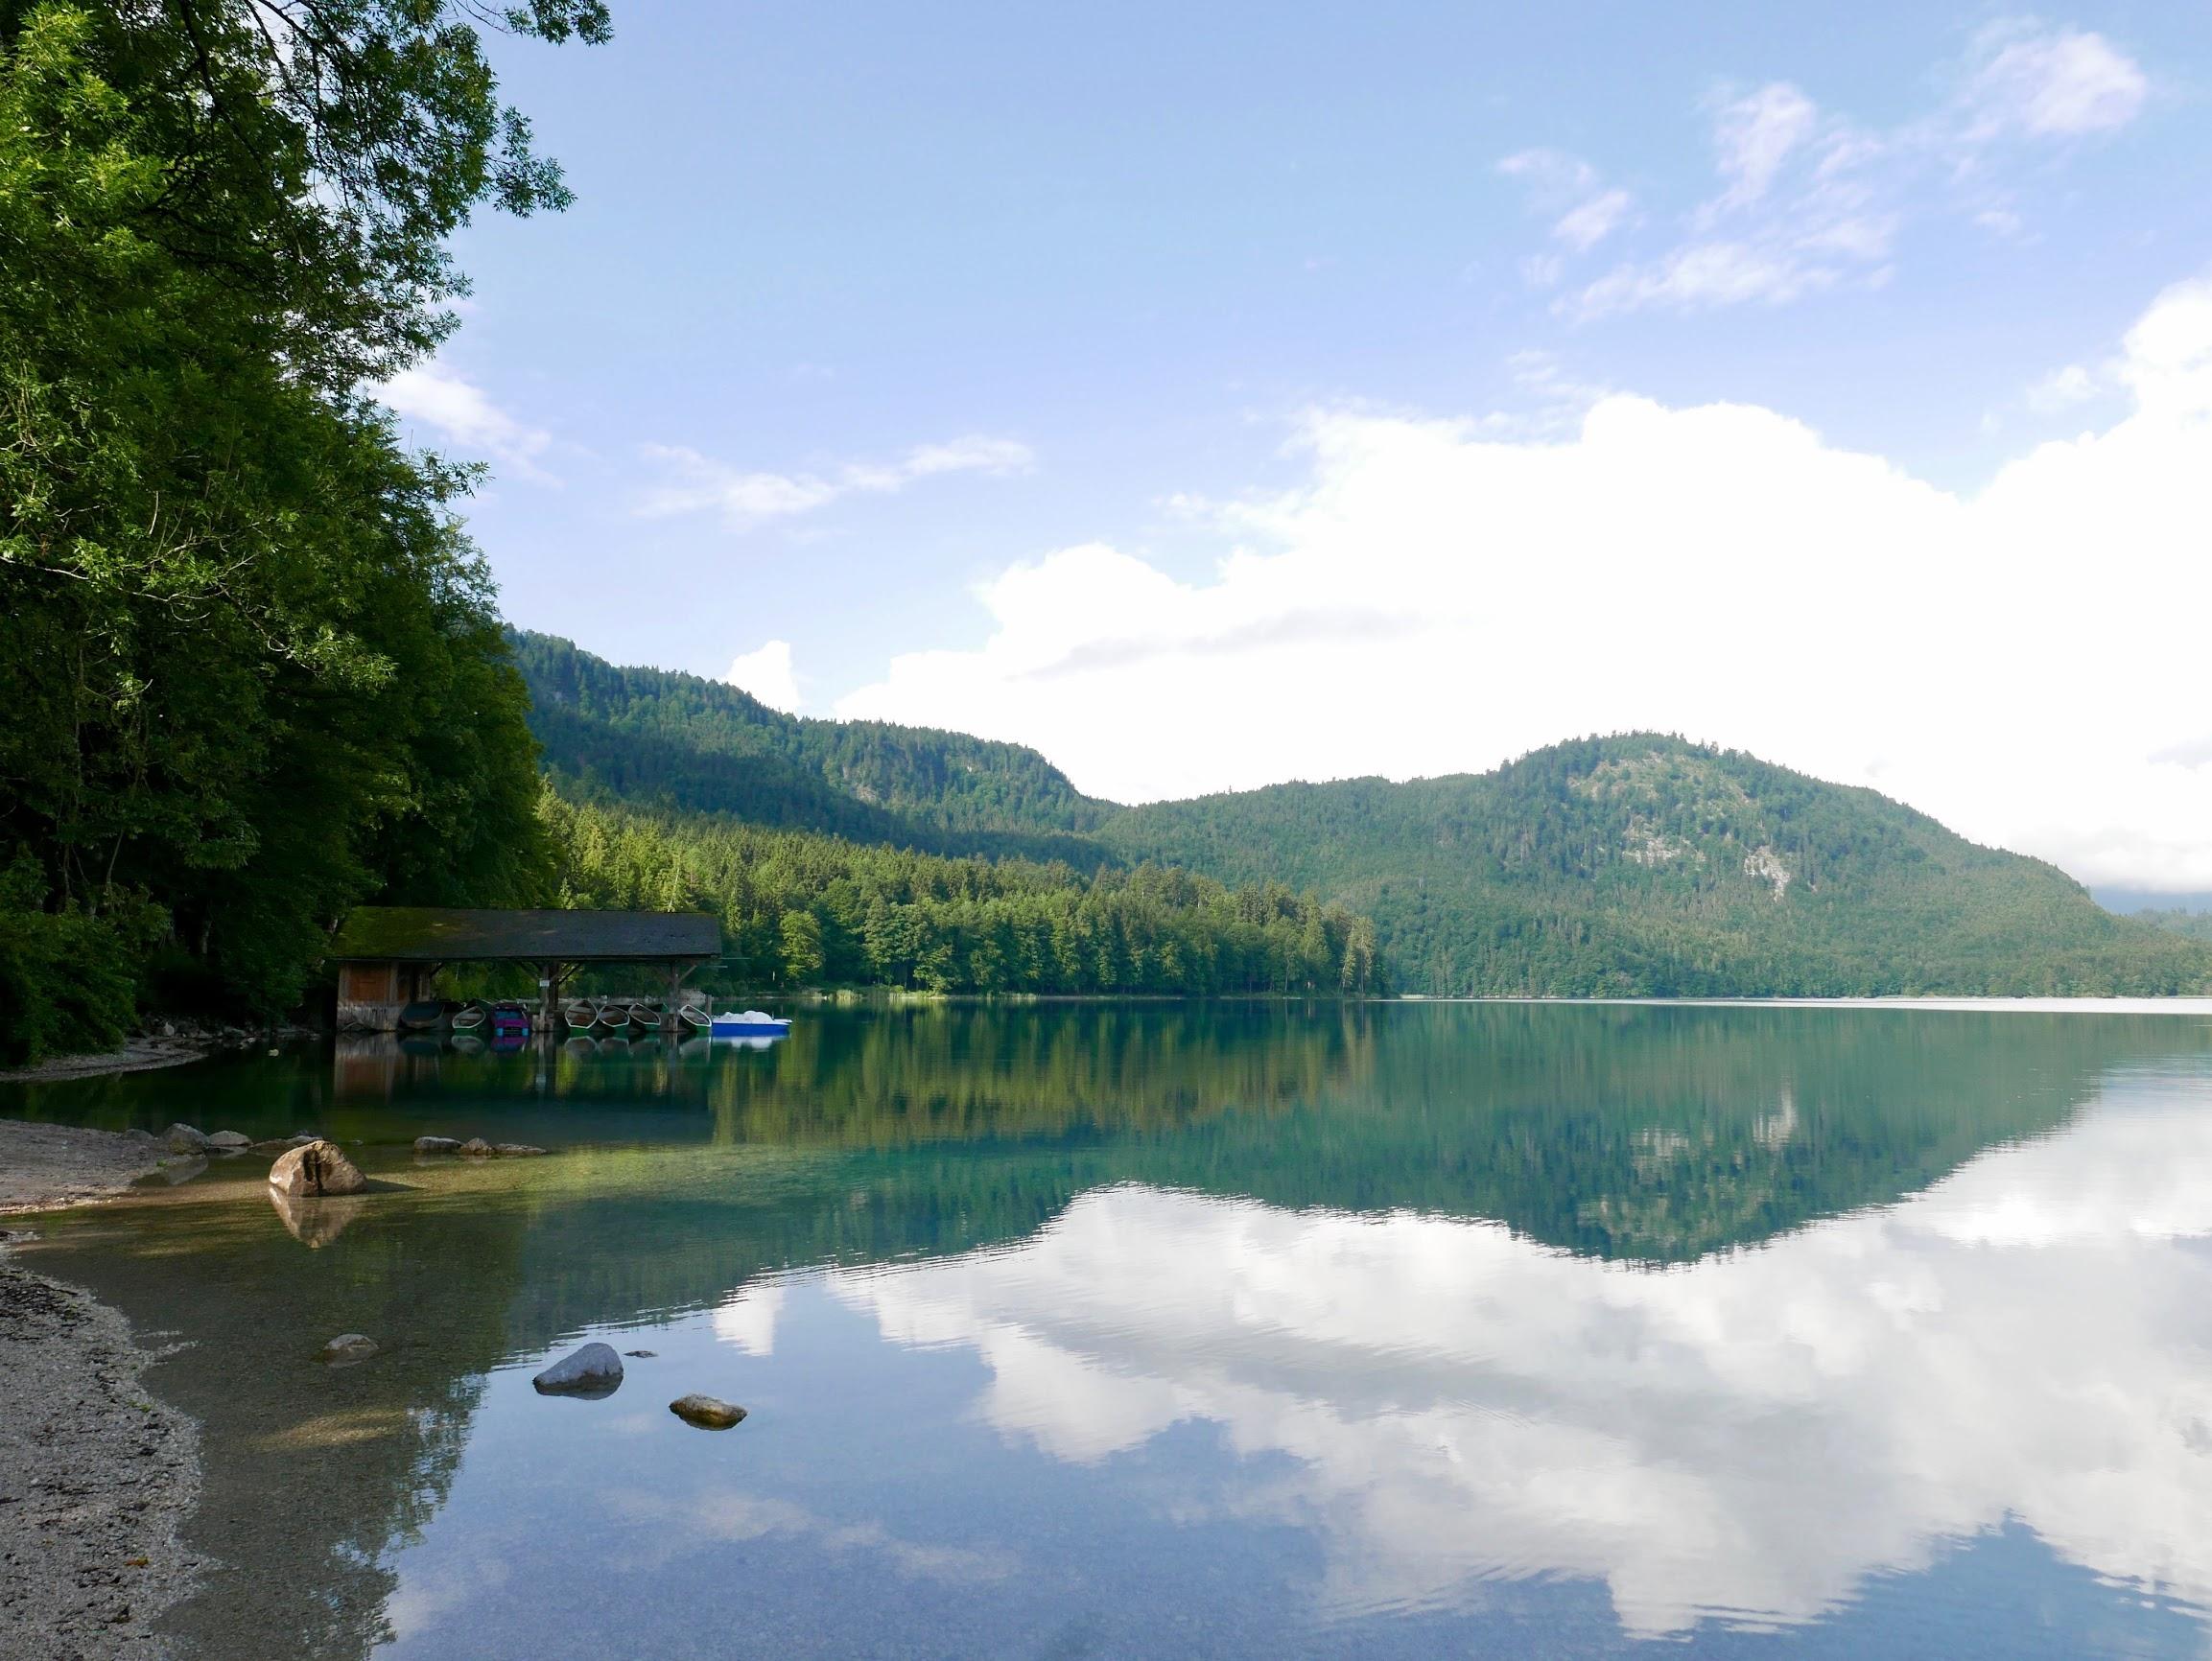 Alpsee, Schwangau